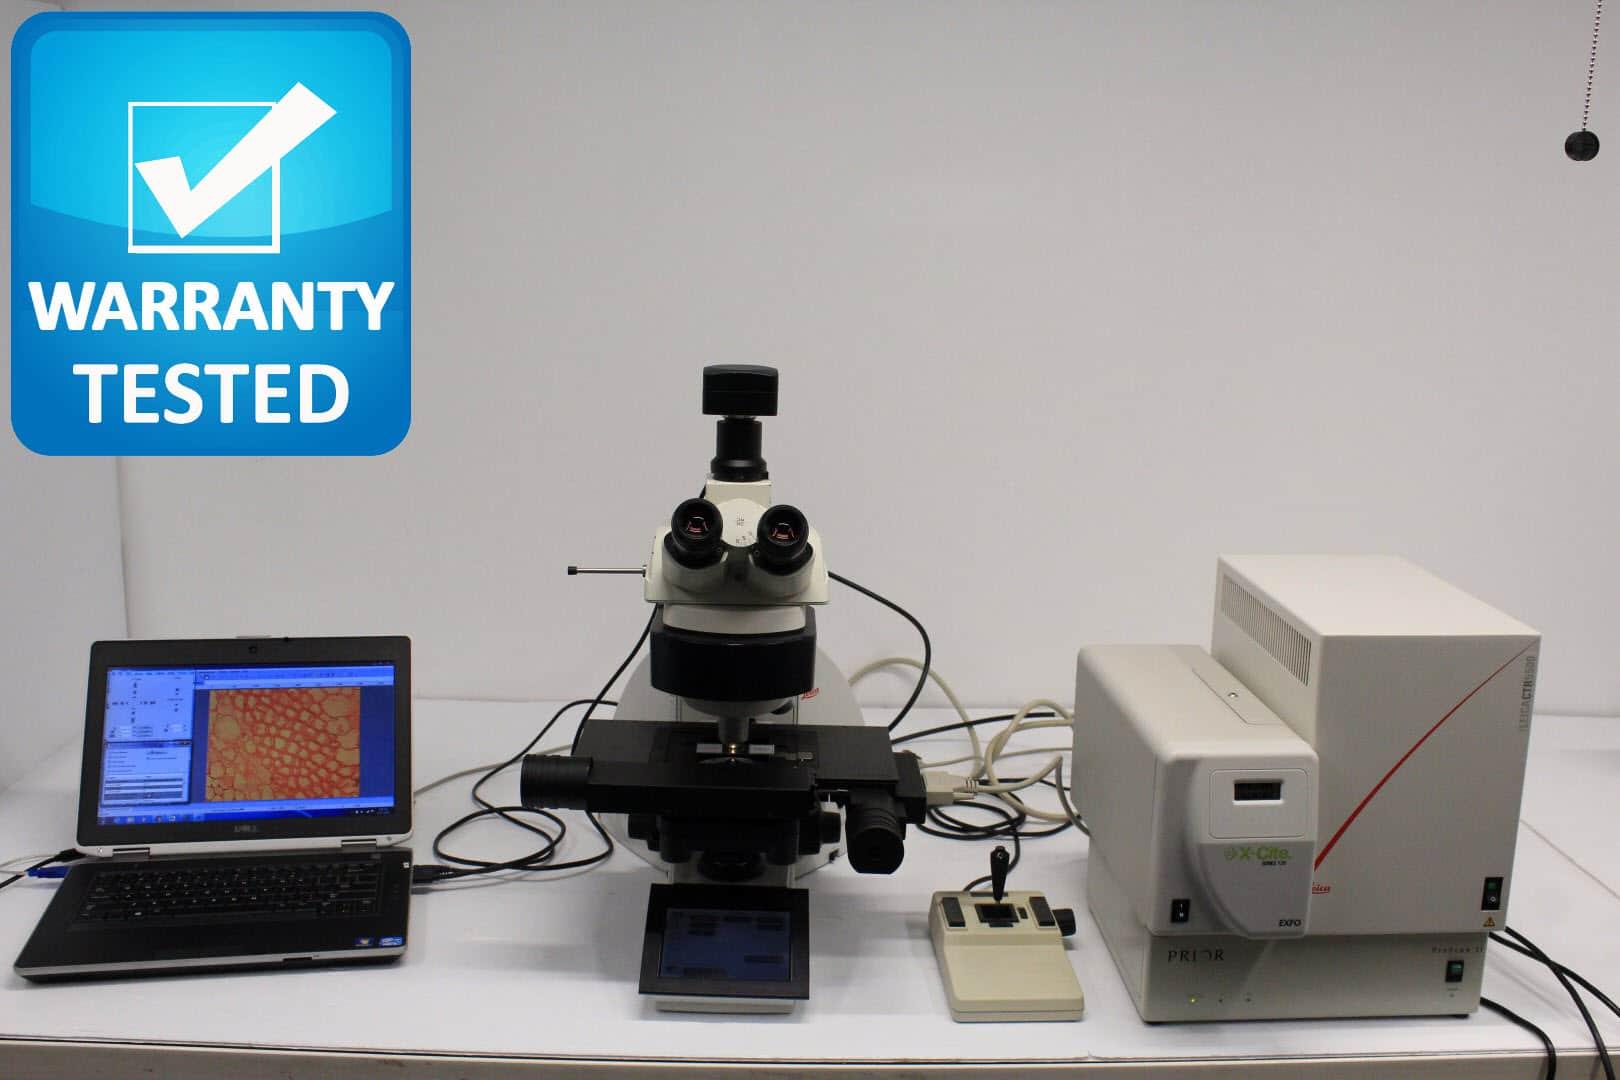 Leica DM6000 B Motorized Fluorescence Phase Contrast Microscope